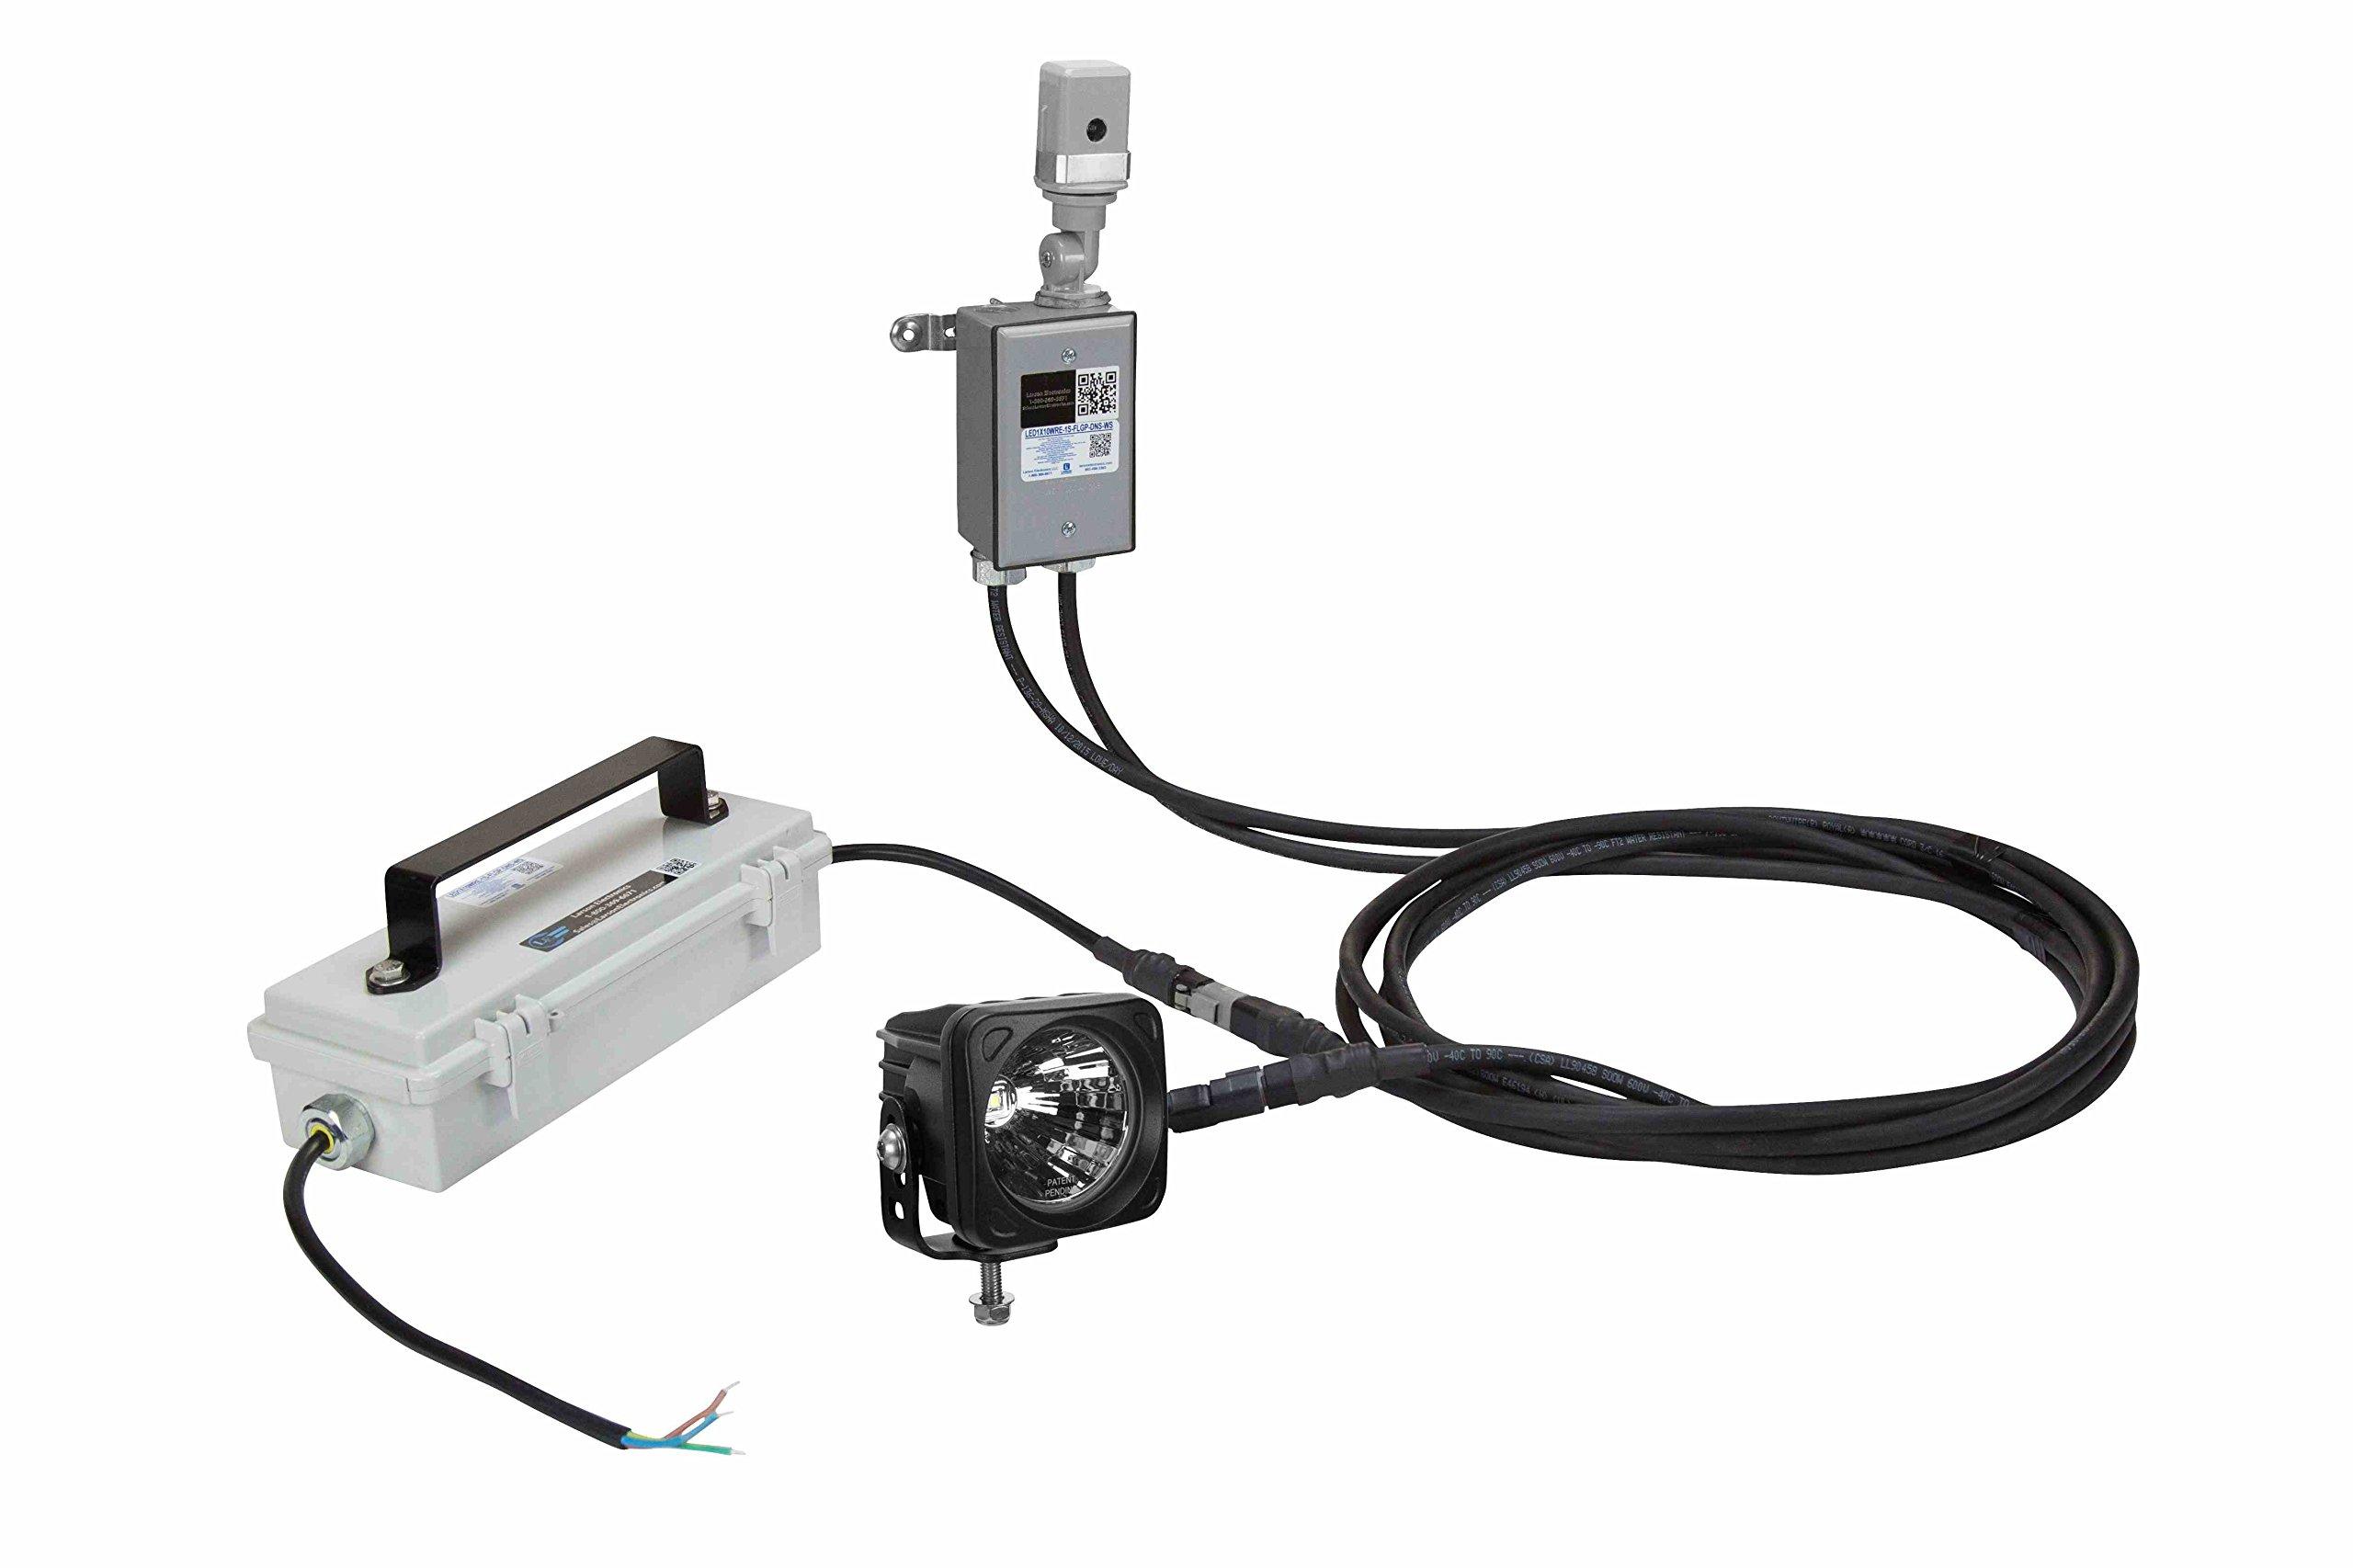 LED Flag Pole Spot Light w/ Integrated Photocell - 10 Watt LED - 120/277VAC 50/60Hz - Day/Night (-20° Wide Spot)